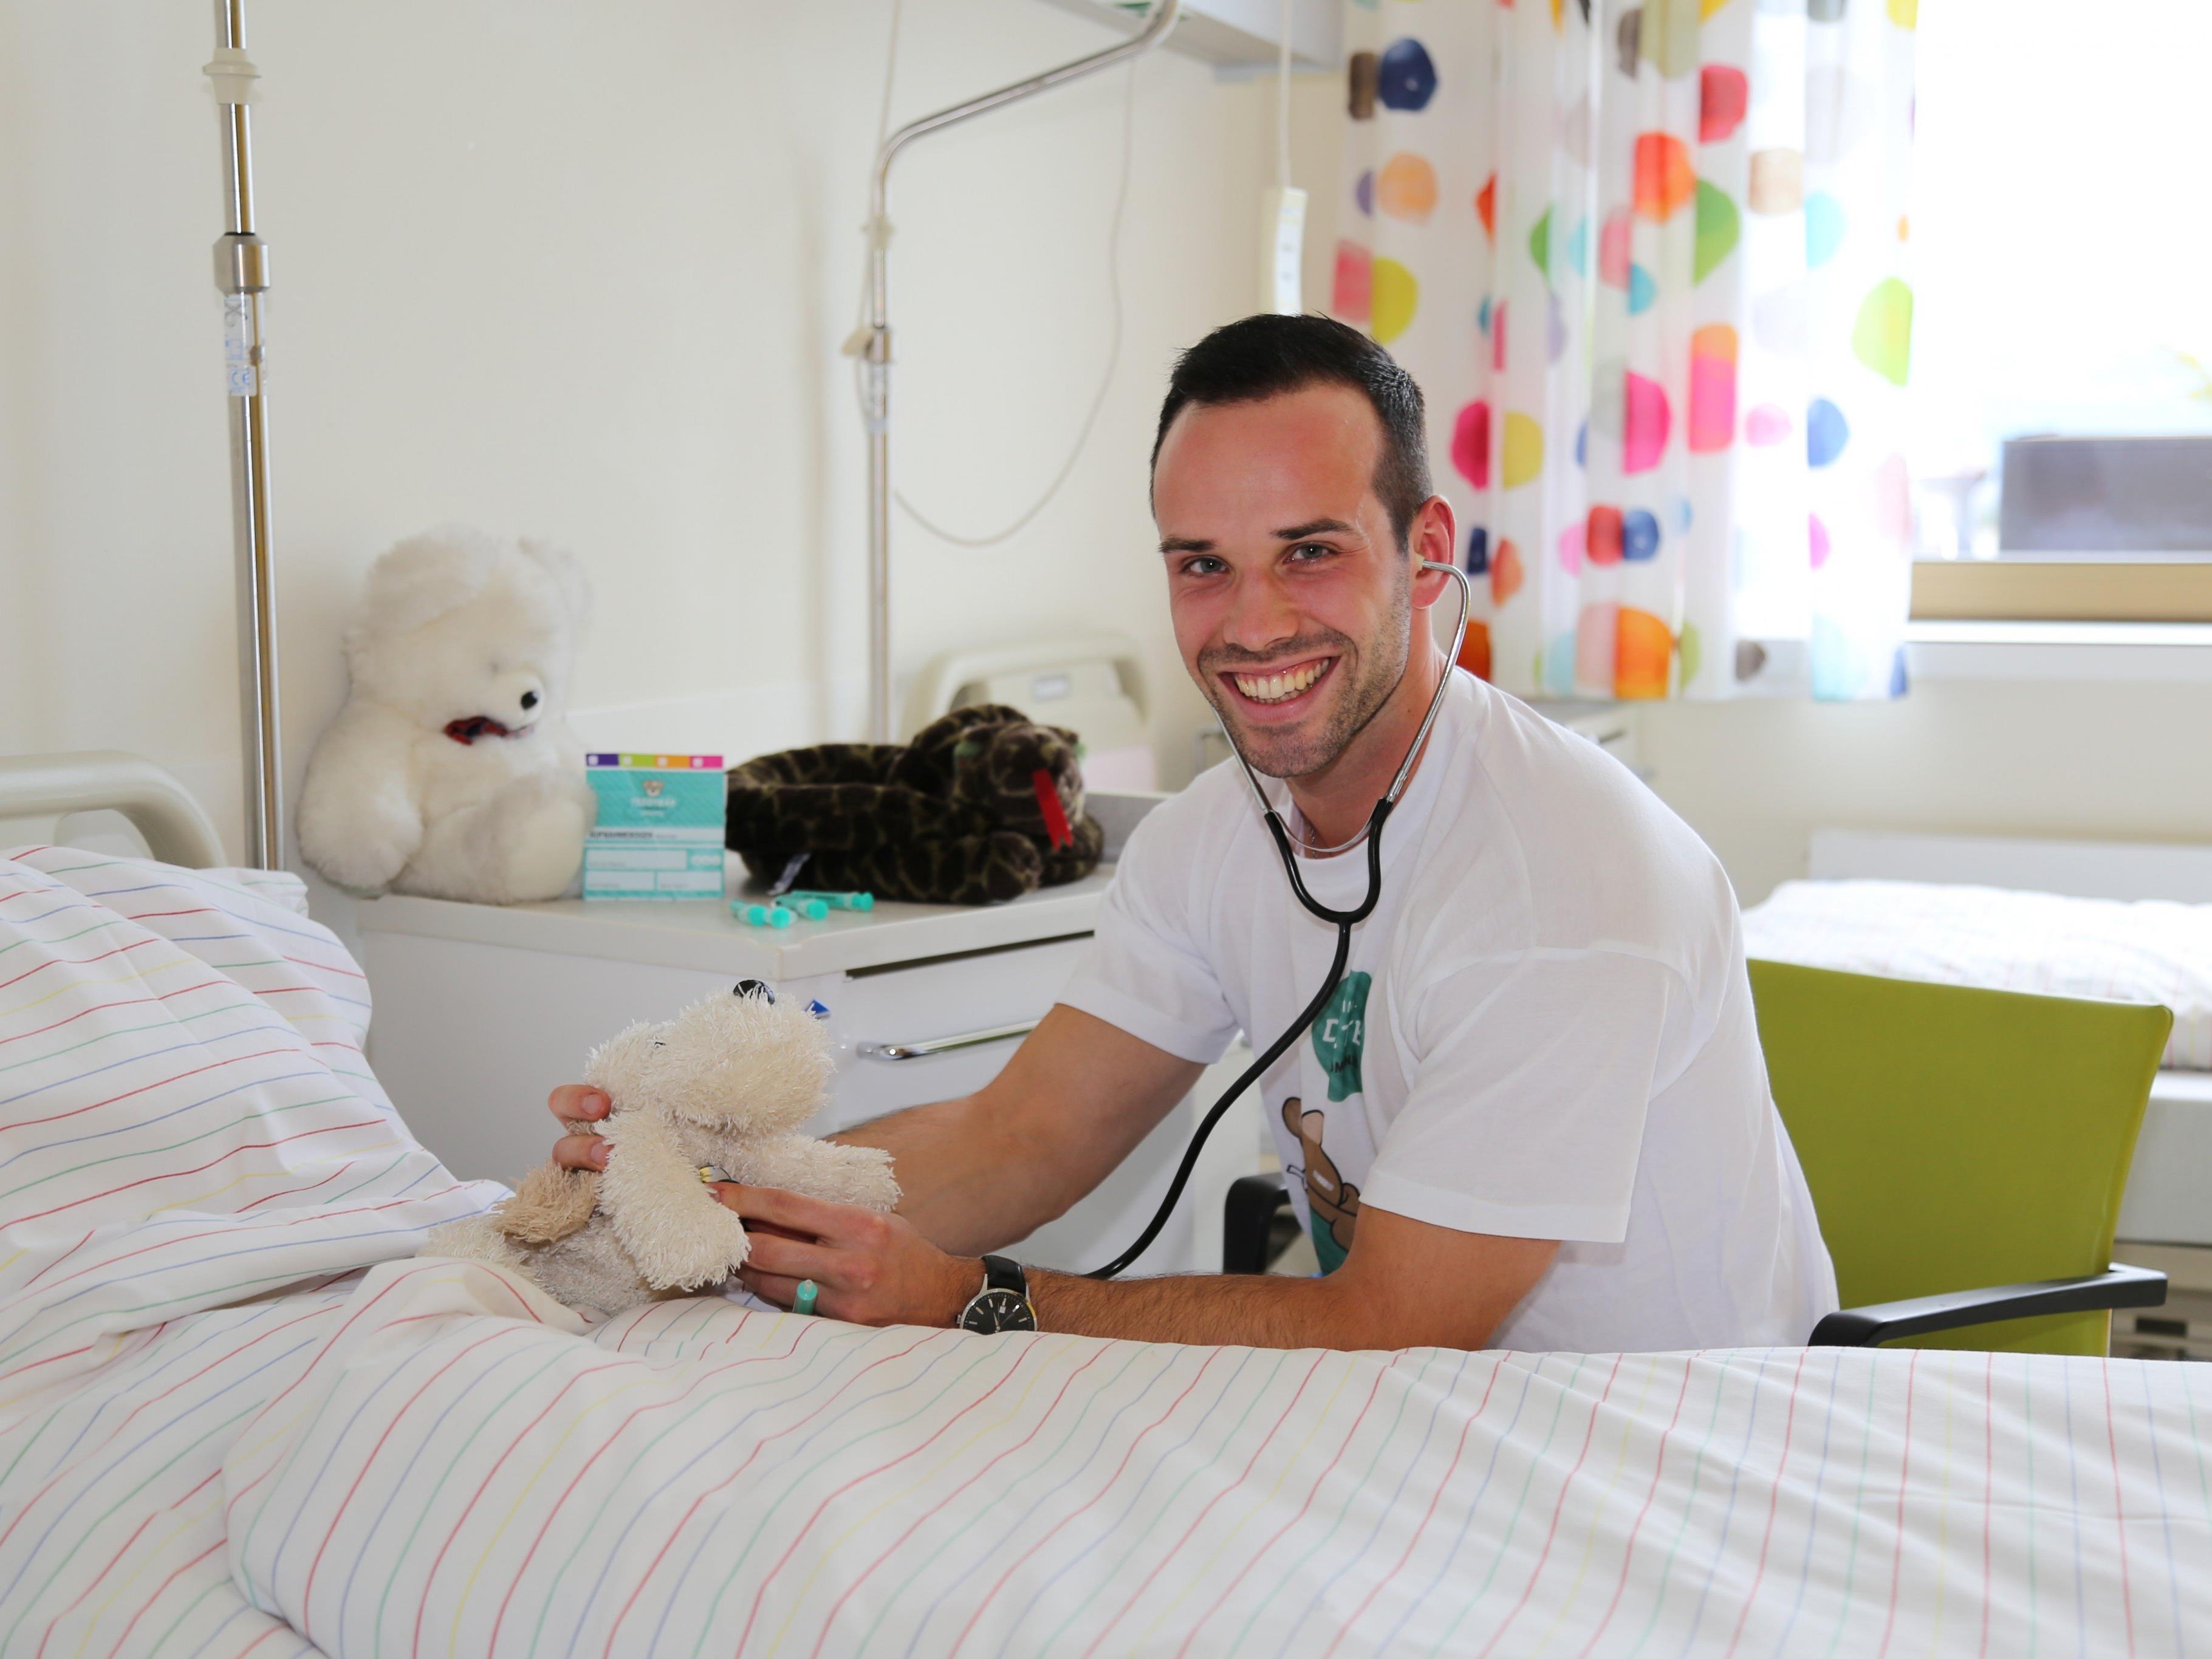 Der 24-jährige Medizinstudent Dominik Klug bringt das Teddybärenkrankenhaus nach Feldkirch.